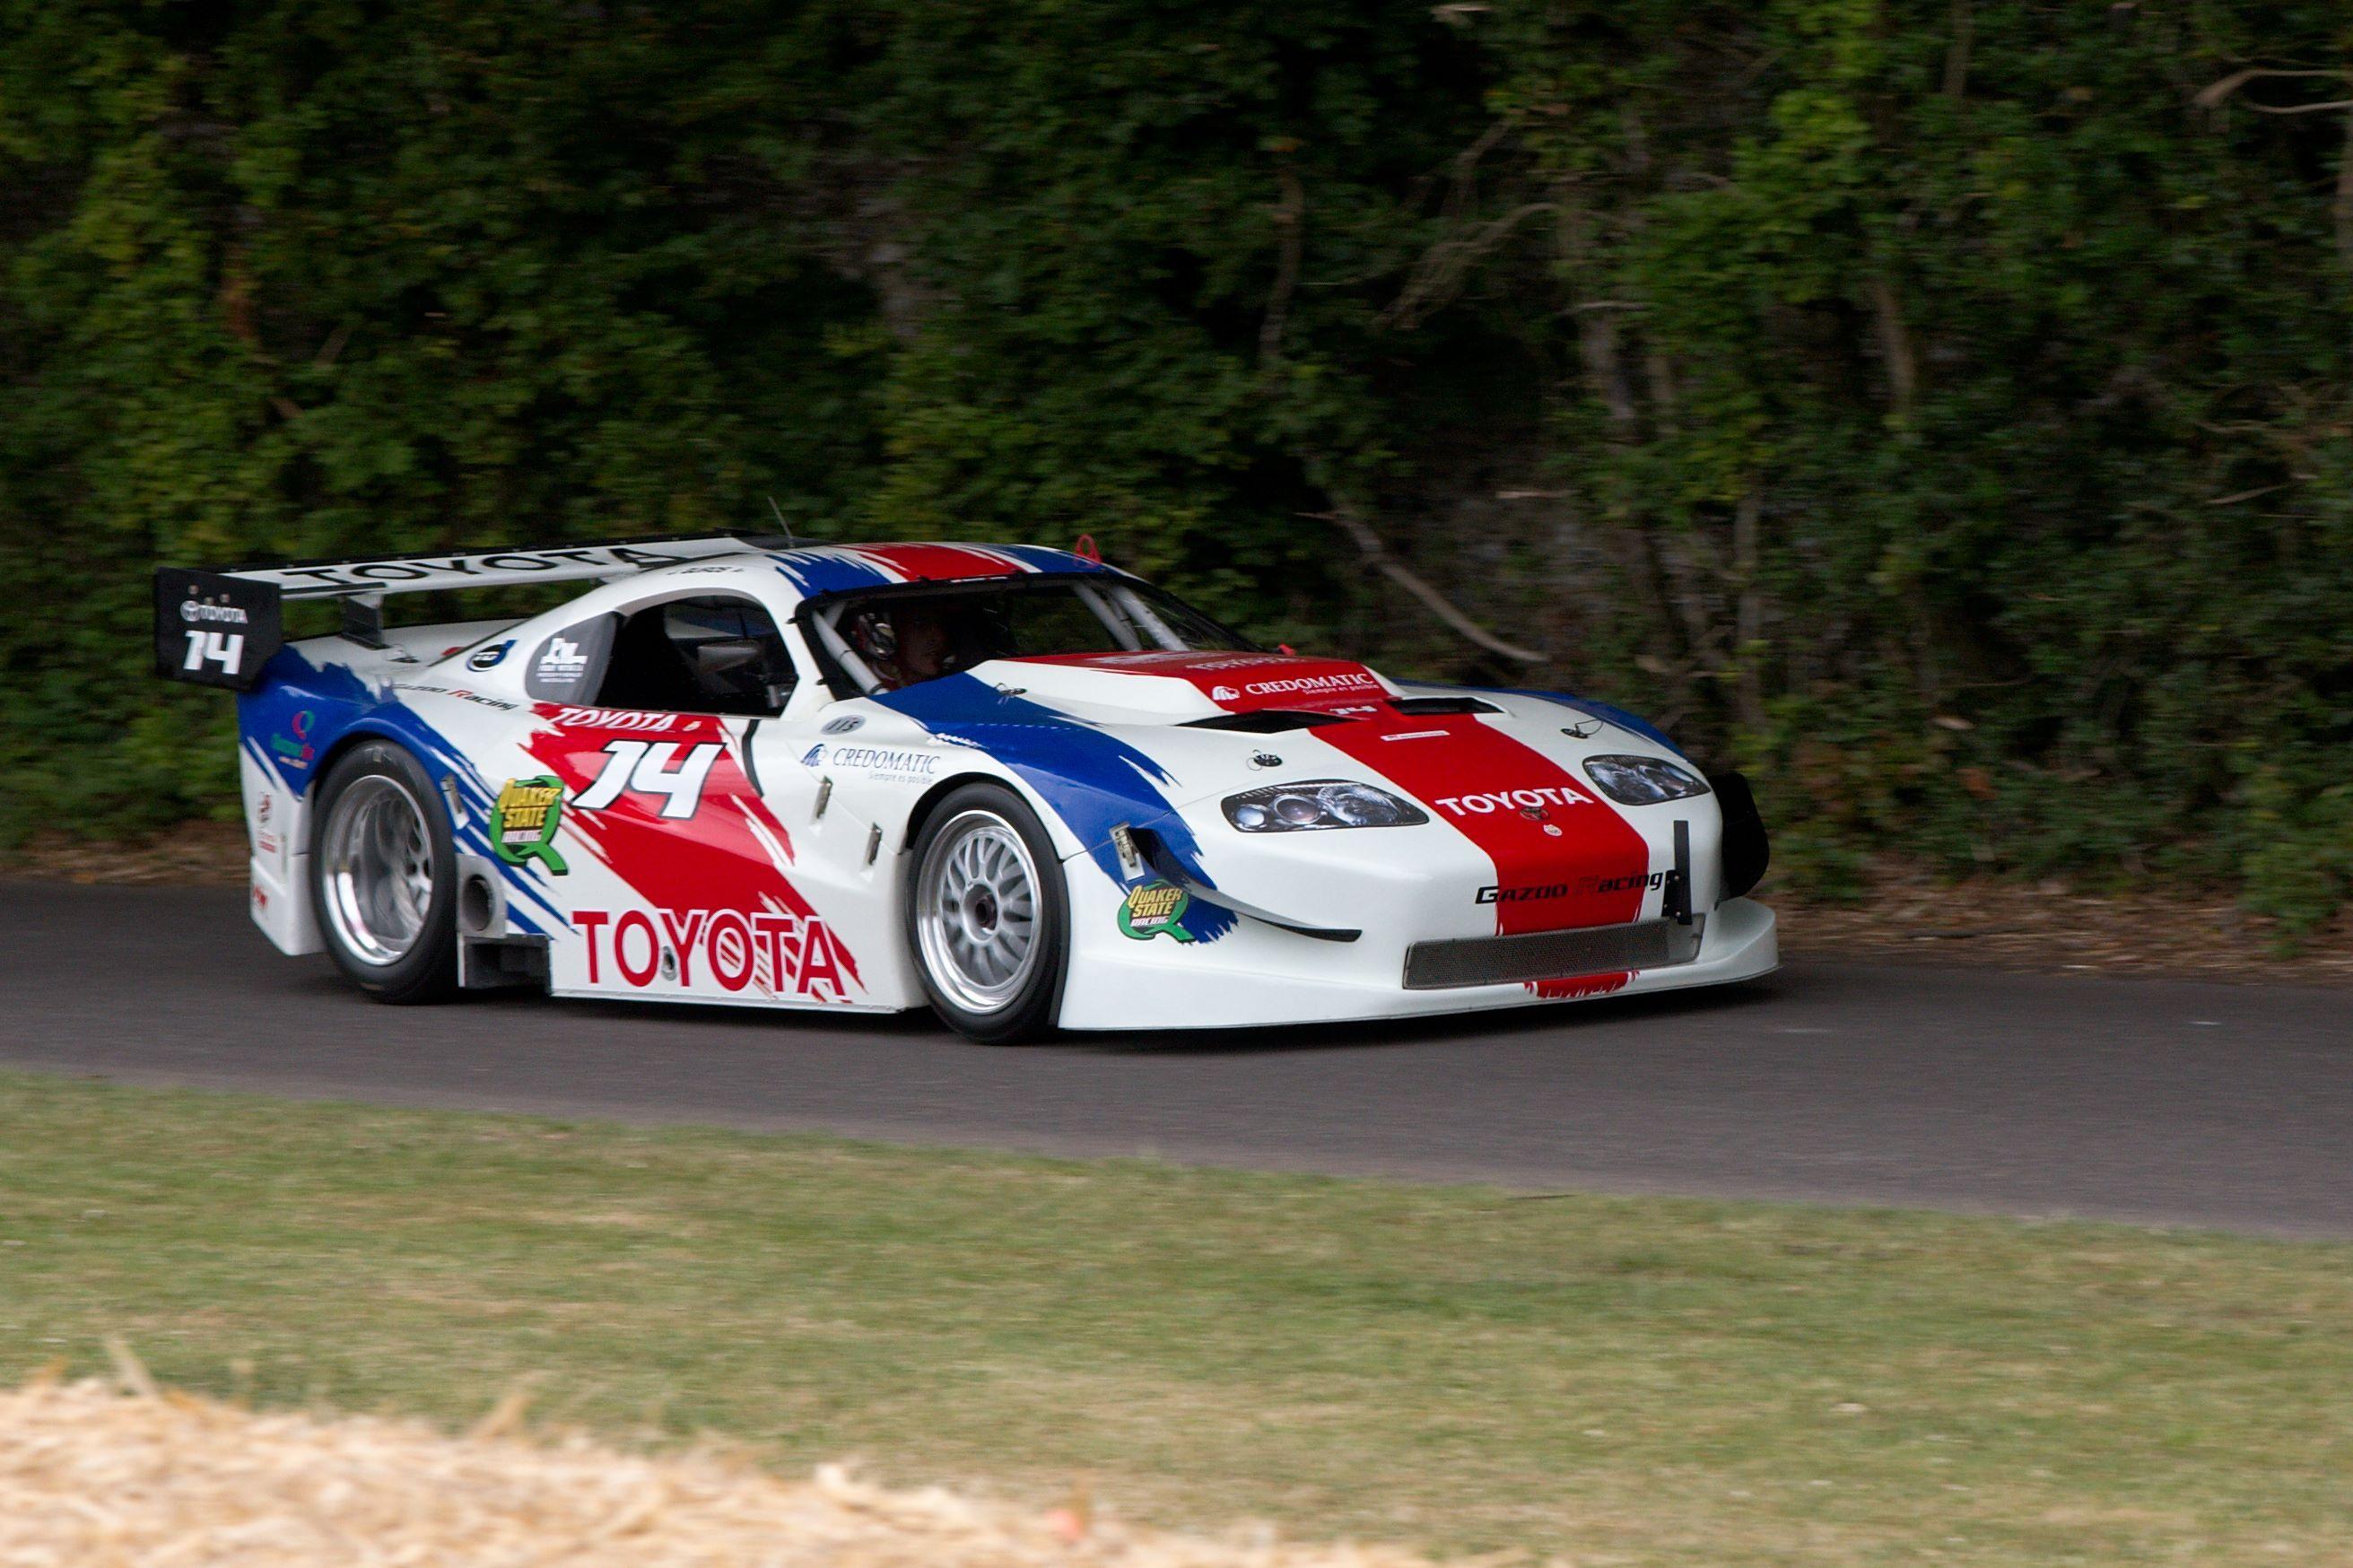 14 Toyota Supra Race Car | Le Mans | Pinterest | Toyota supra ...